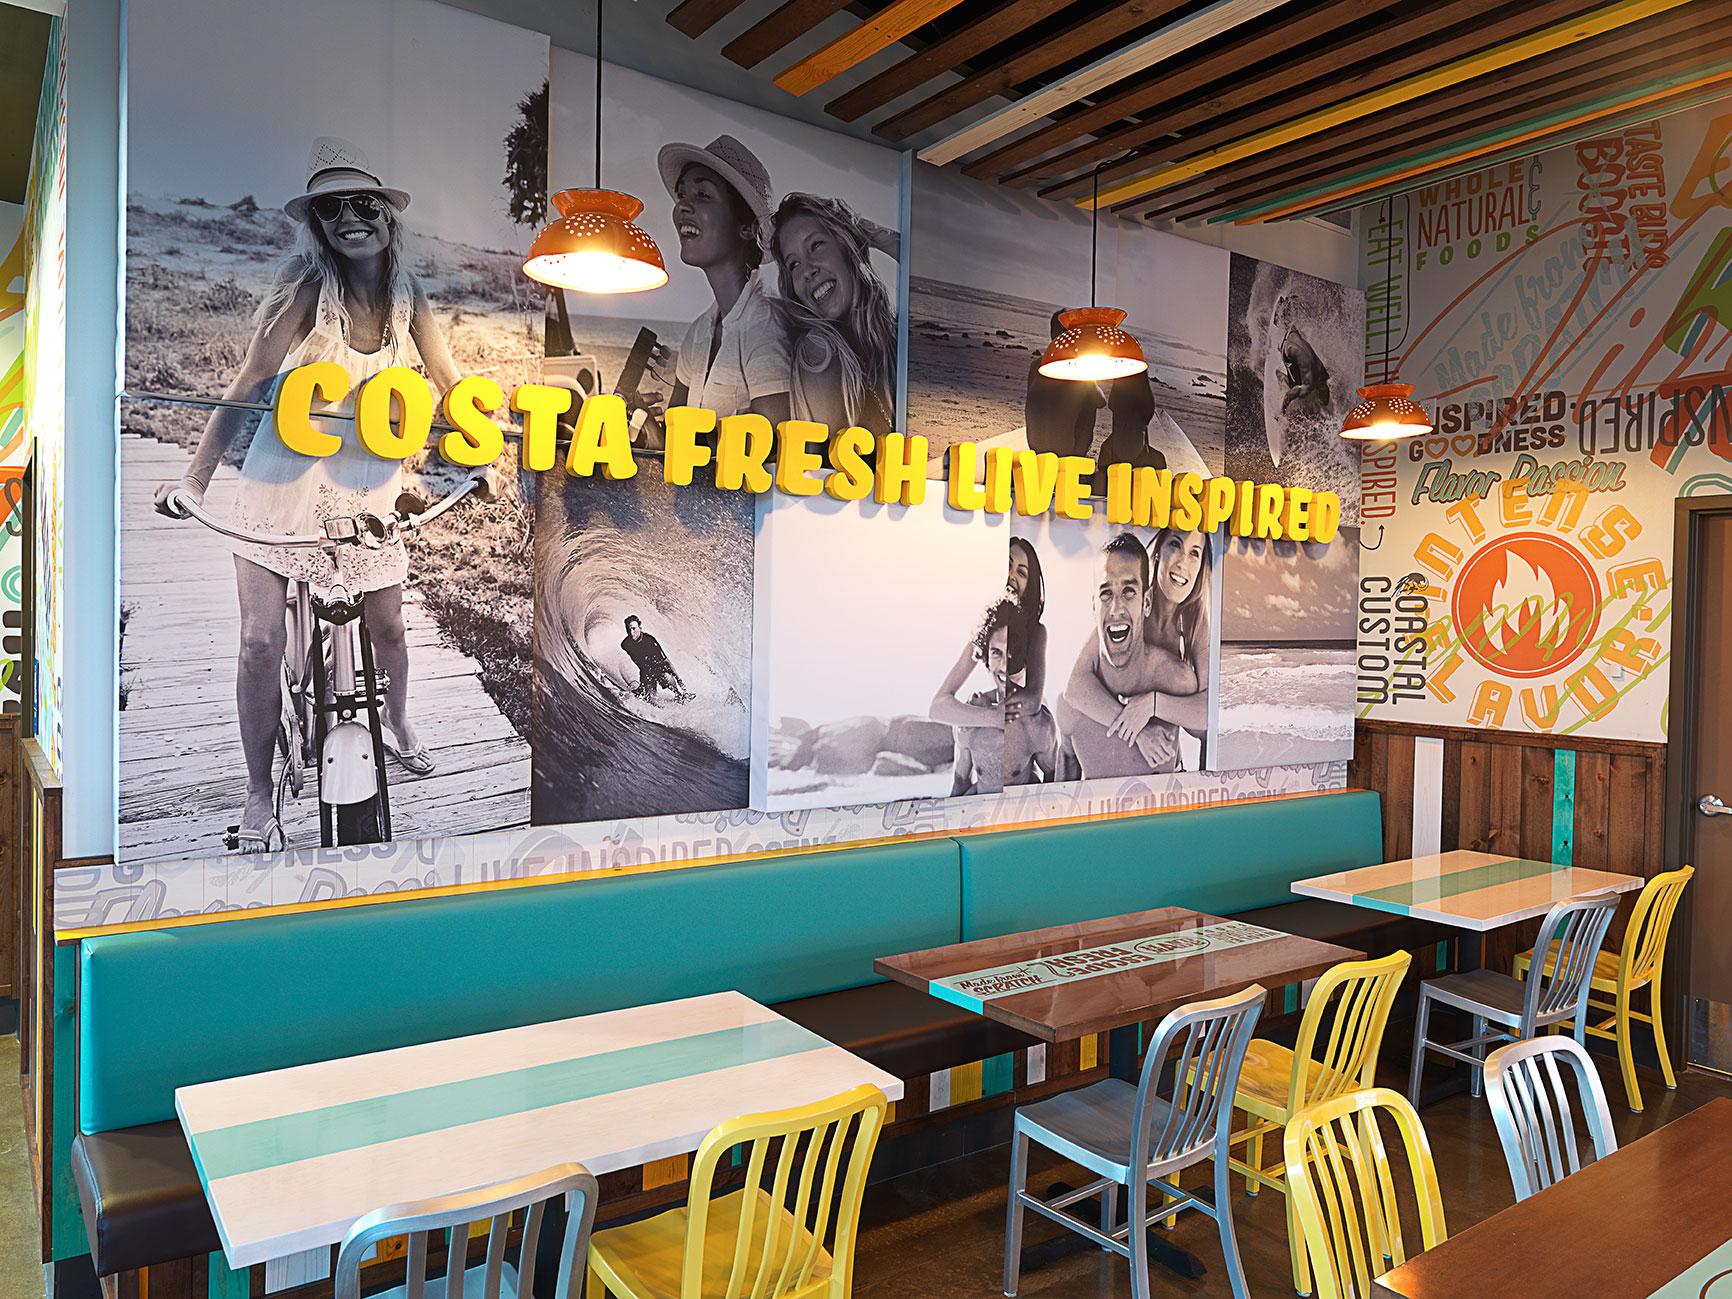 Costa Vida - Fresh Mexican